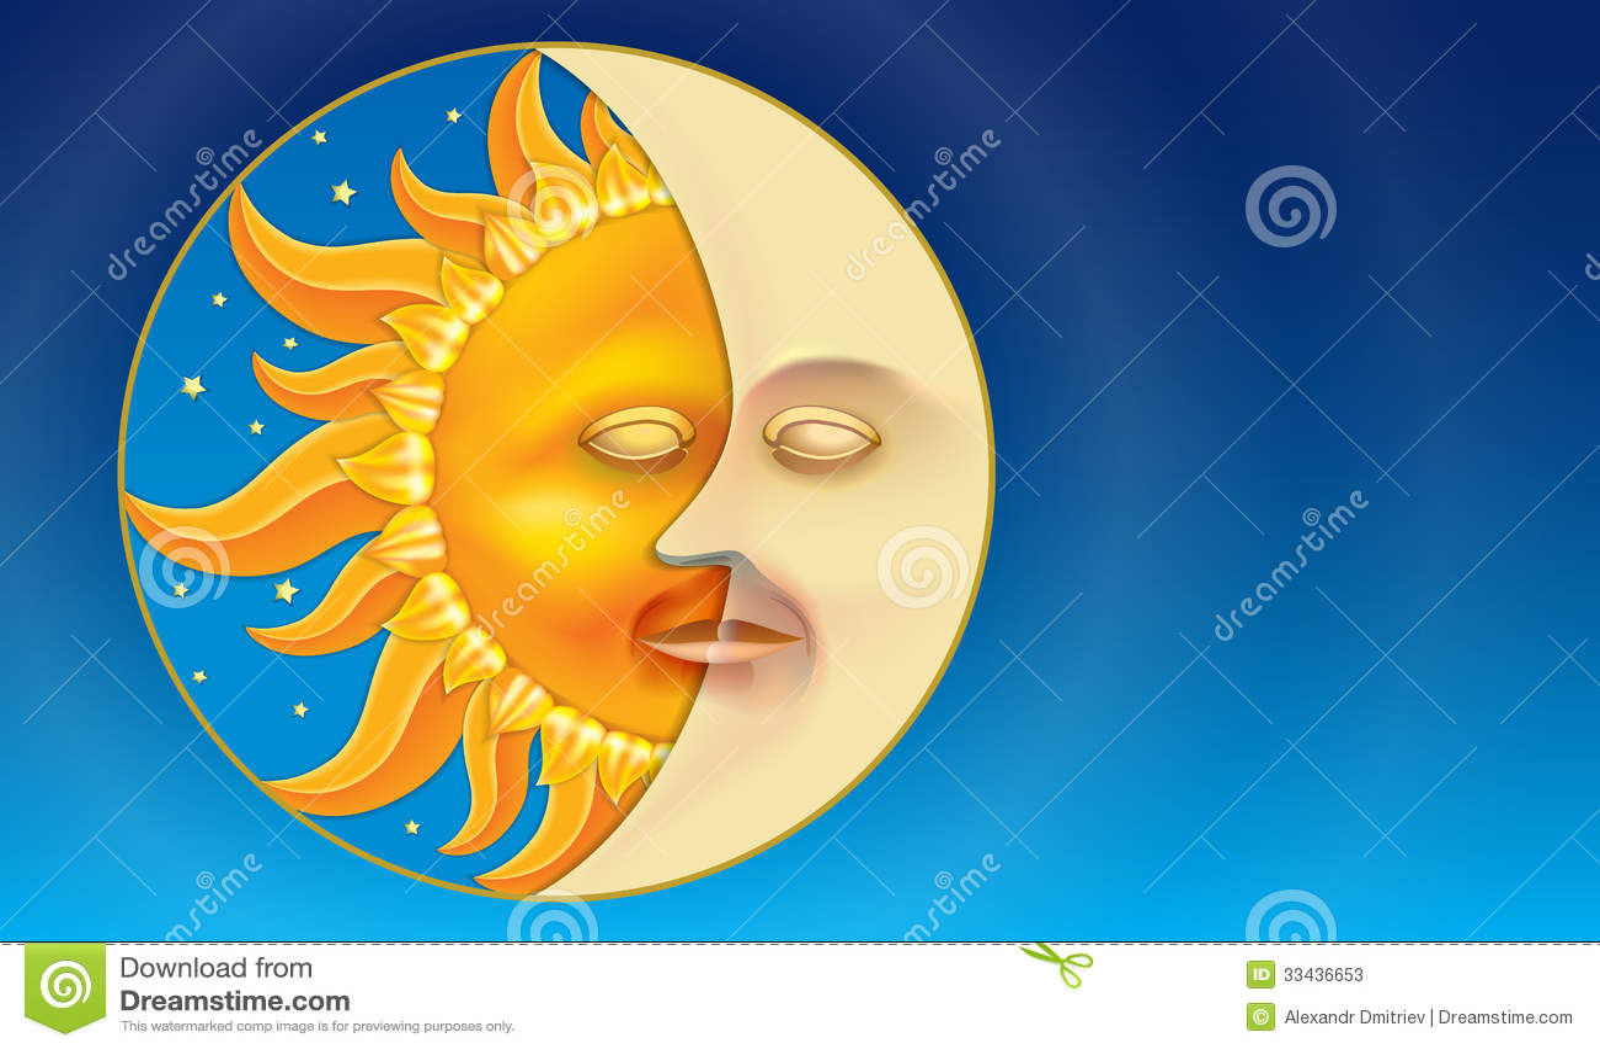 《拥抱太阳的月亮》爆ng